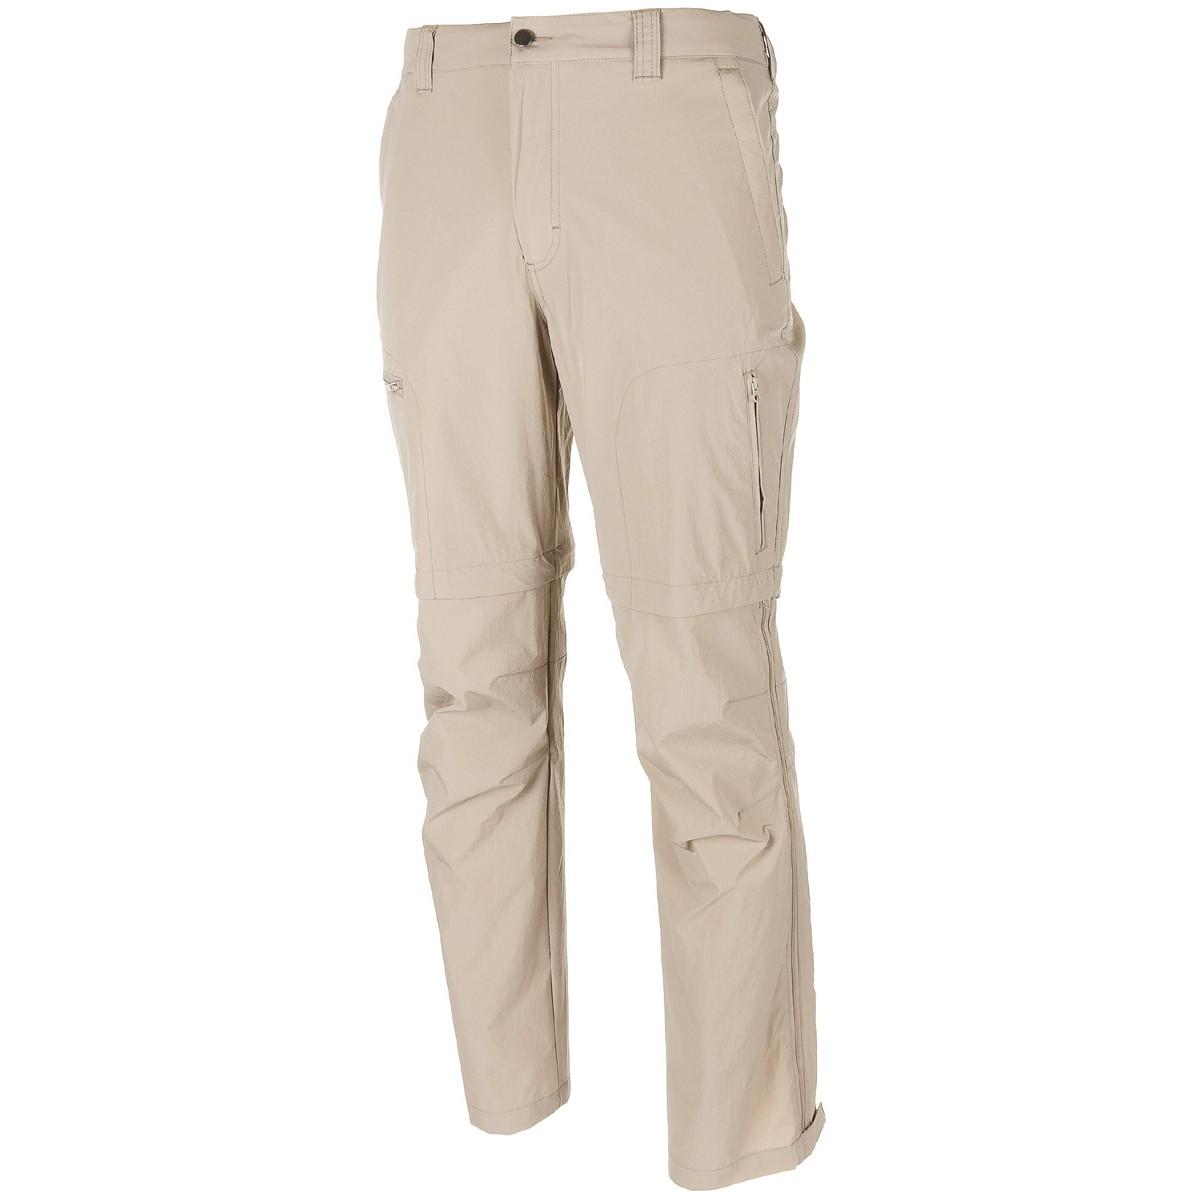 Nohavice RACHEL trekkingové odopínateľné KHAKI